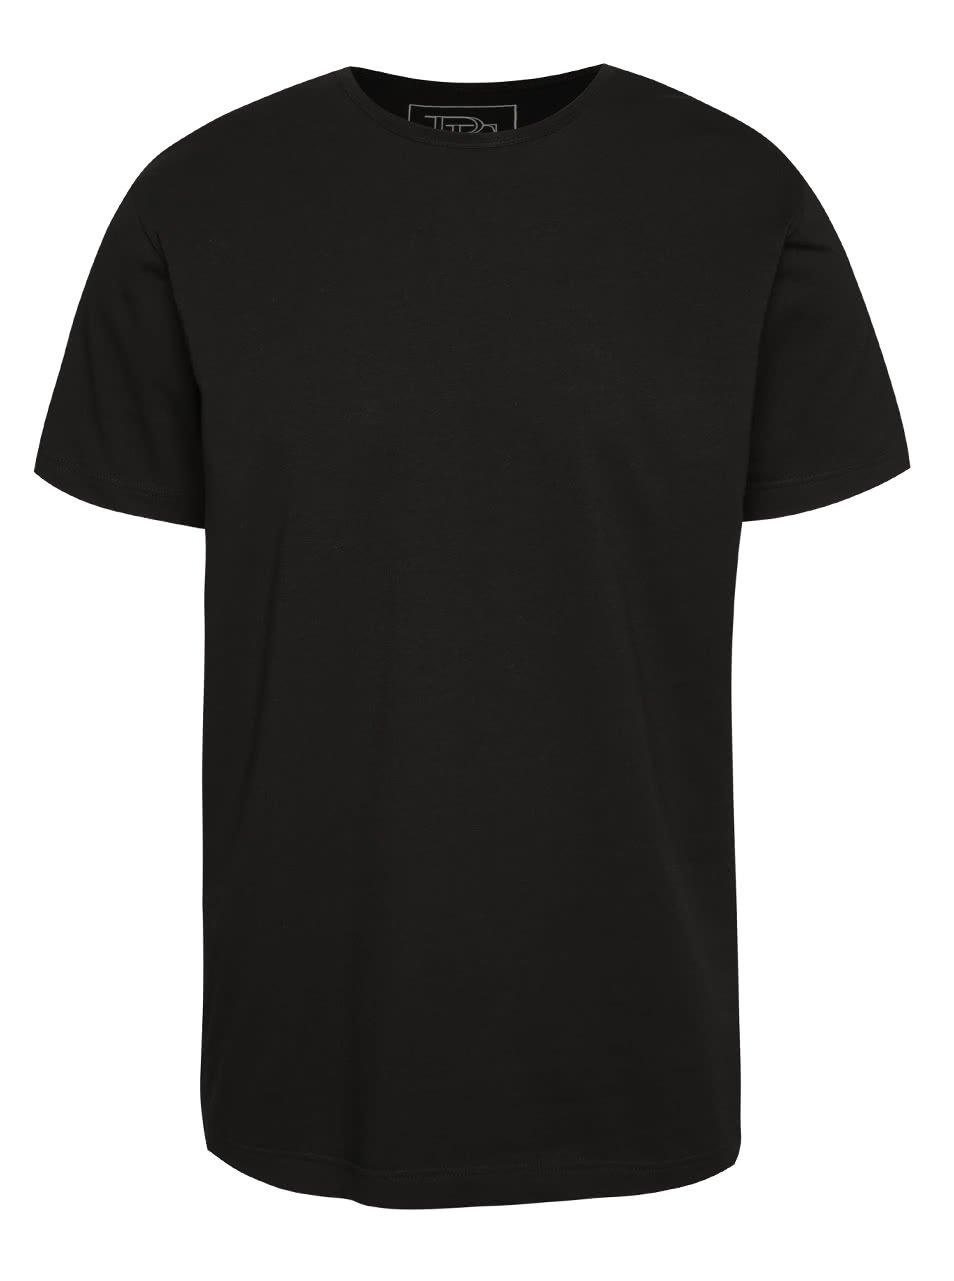 Černé pánské triko s krátkým rukávem Pietro Filipi